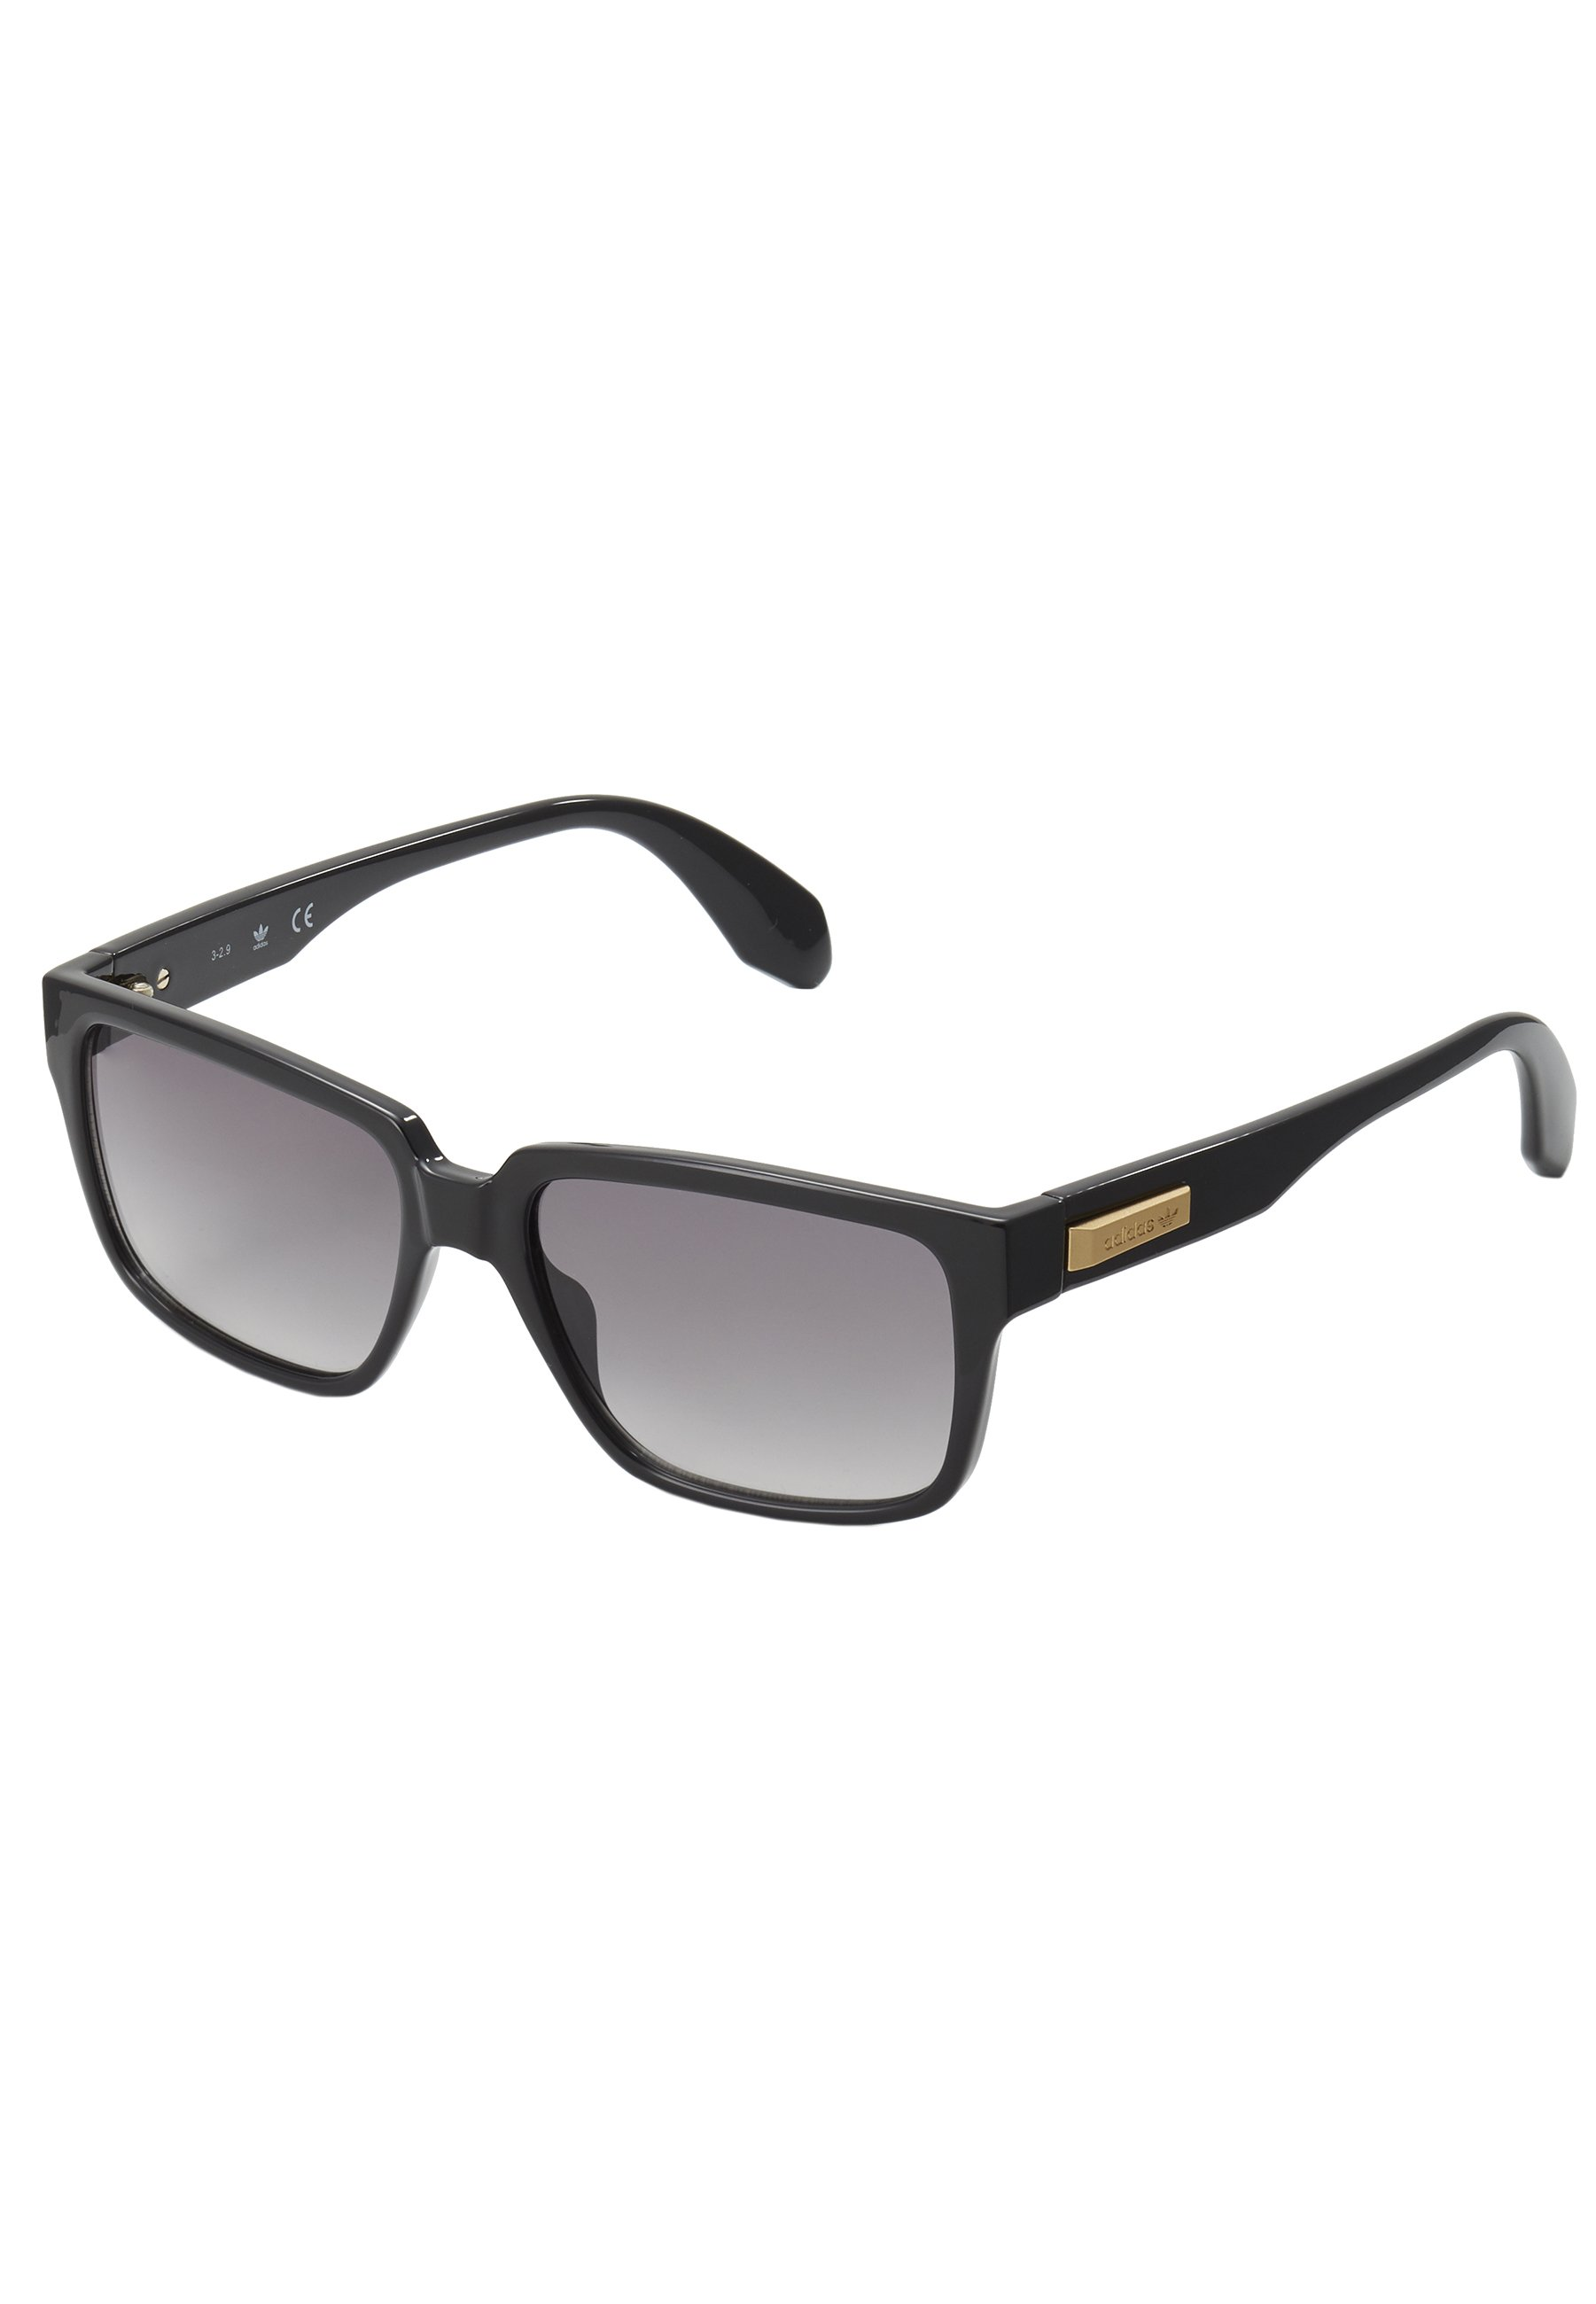 adidas Originals Solbriller - black/smoke/svart dnBszayUuBrxLOn